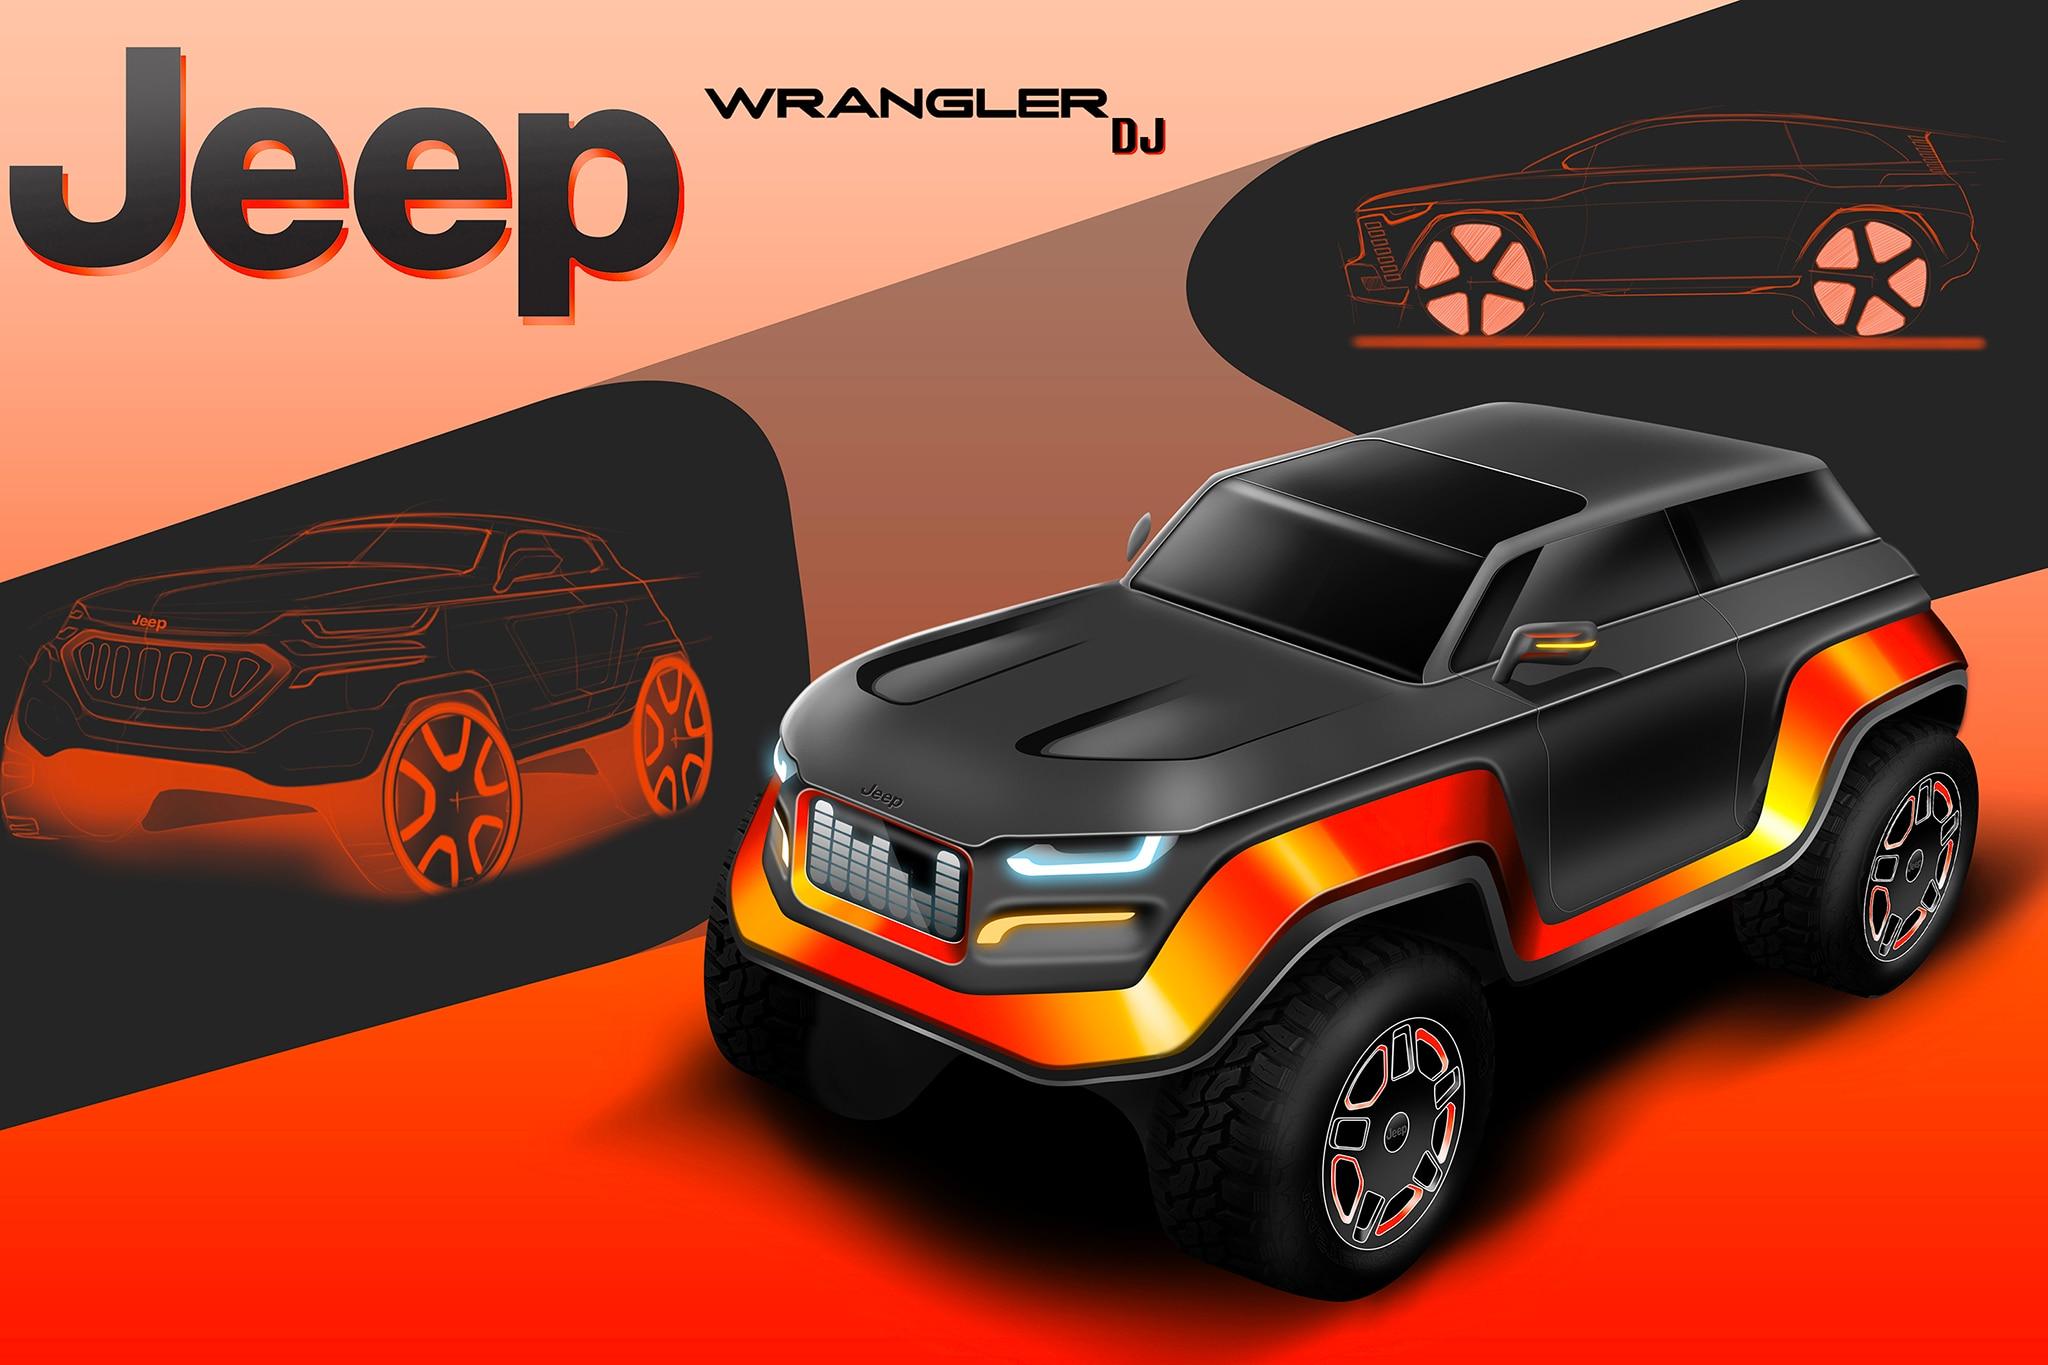 2030 Jeep Wrangler DJ Wins 2018 Drive for Design Contest ...